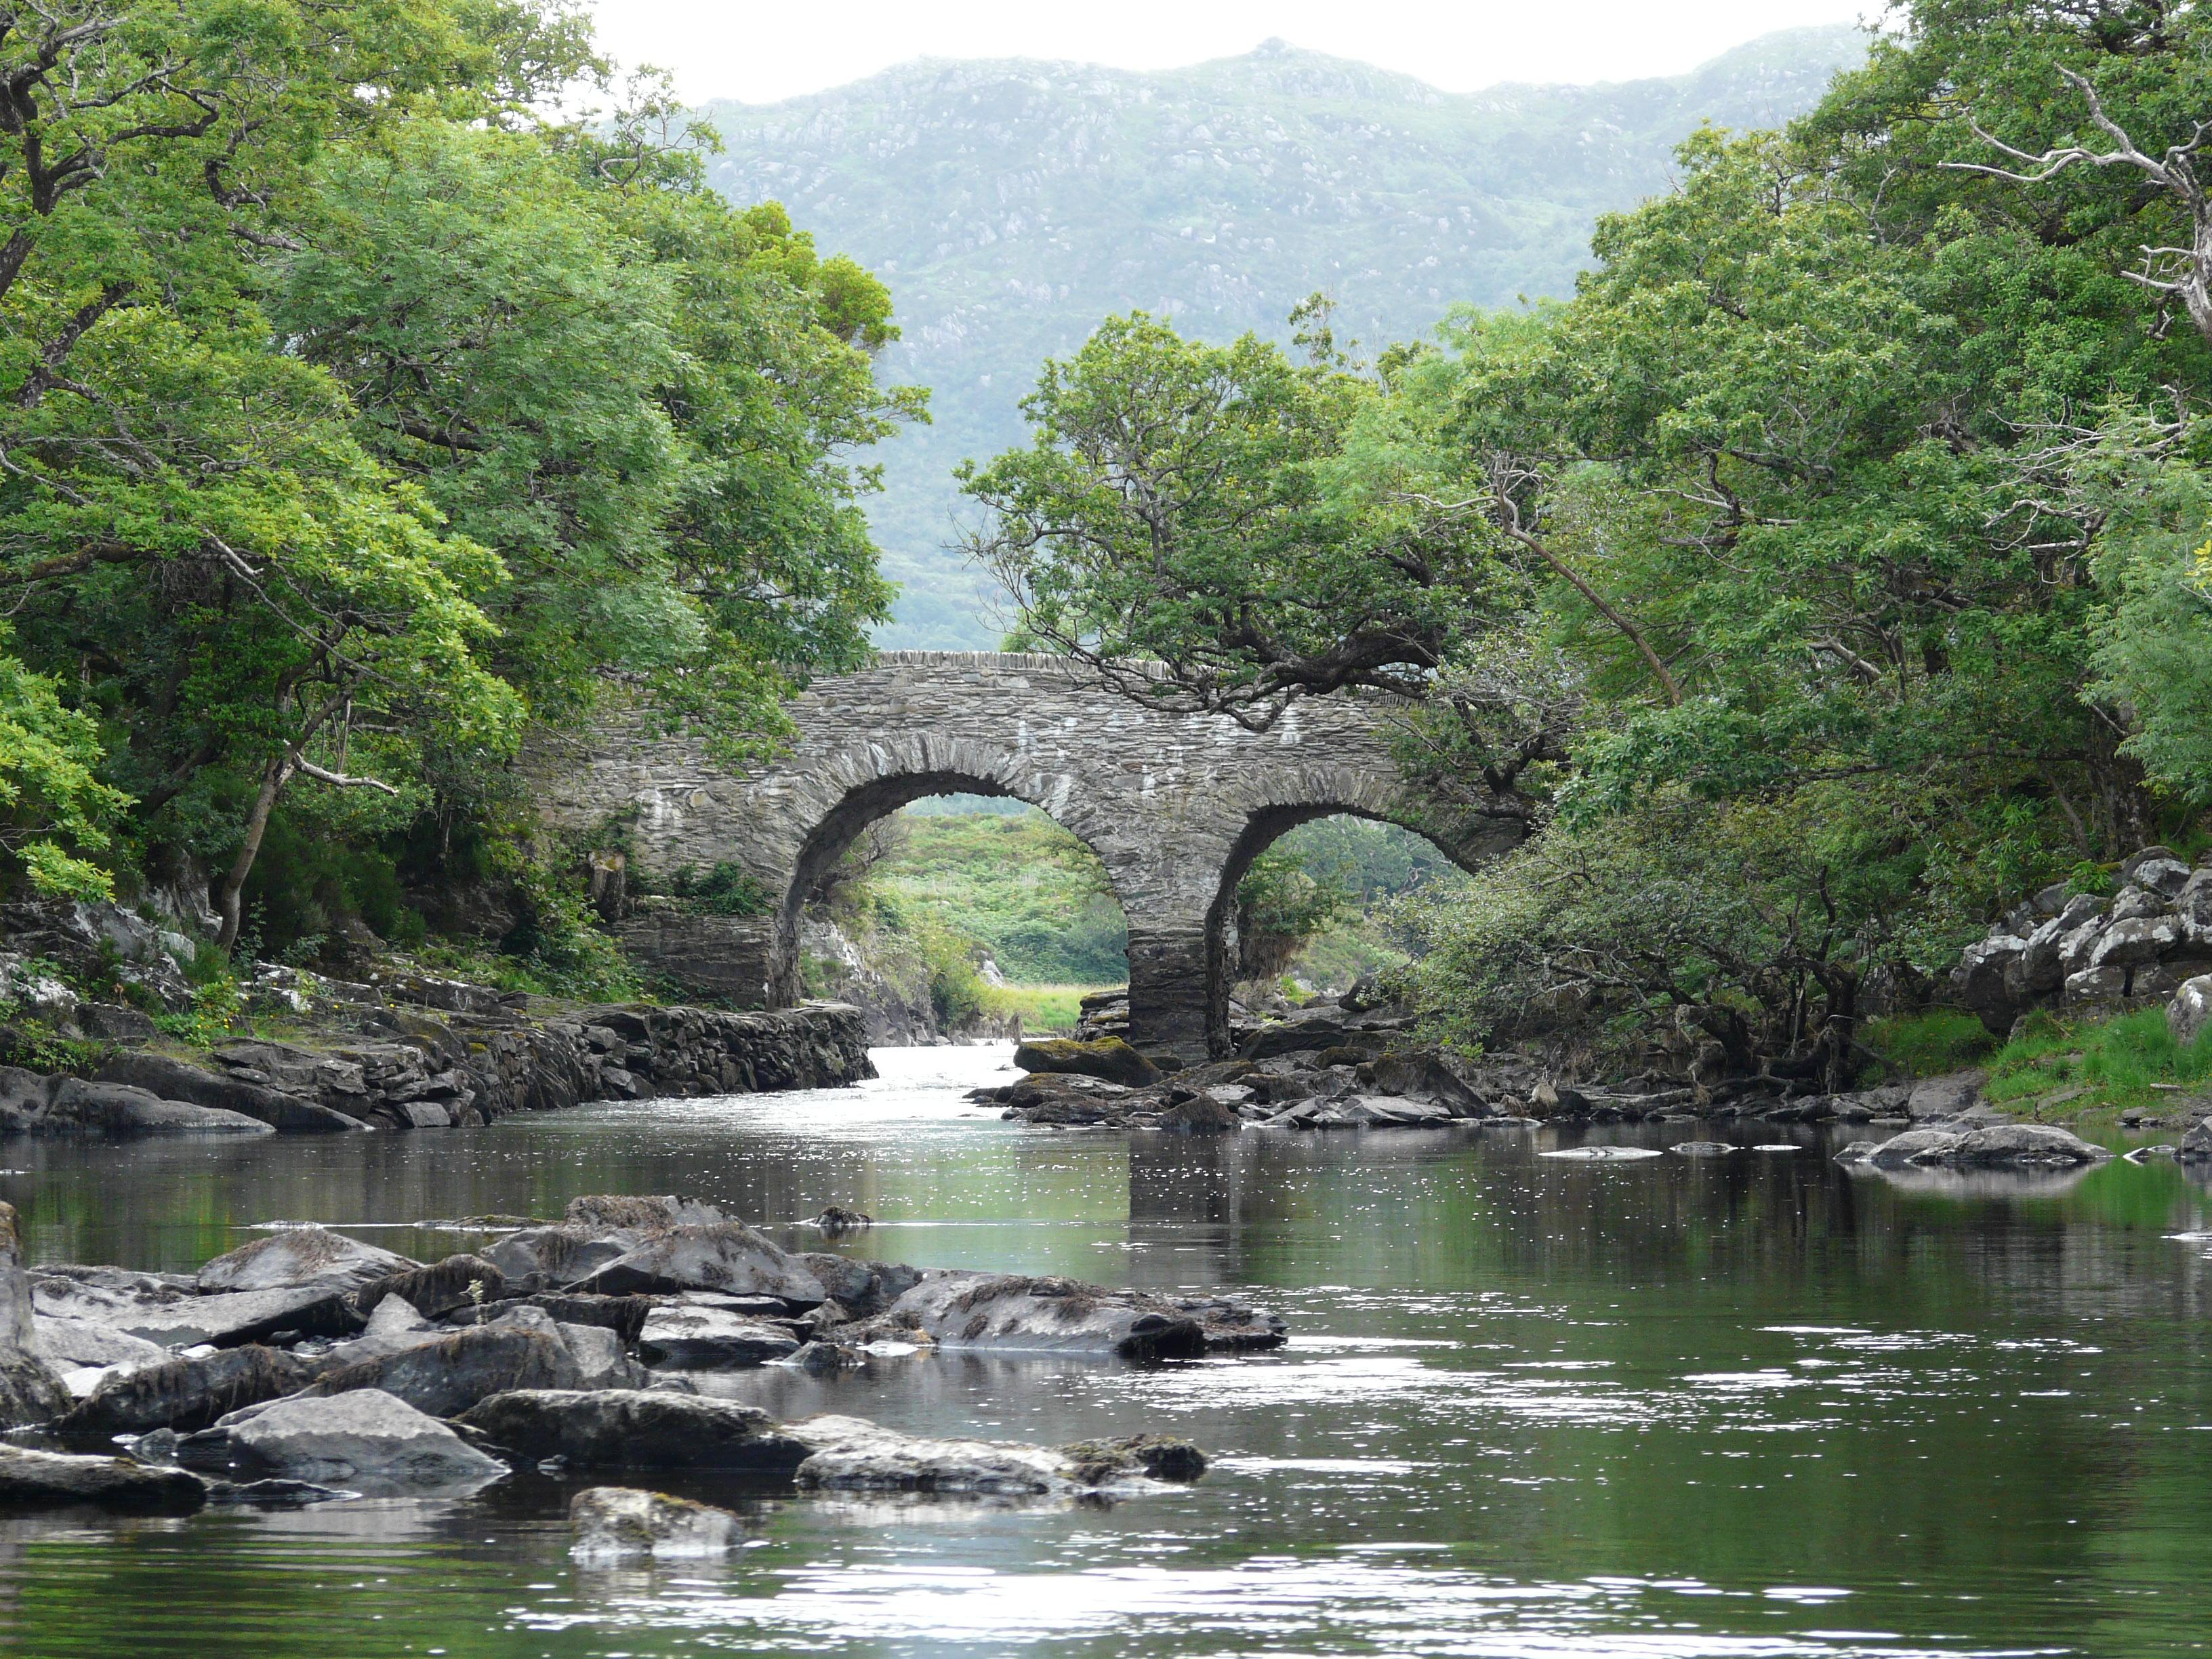 File:Old Weir Bridge, Killarney National Park.jpg - Wikimedia Commons